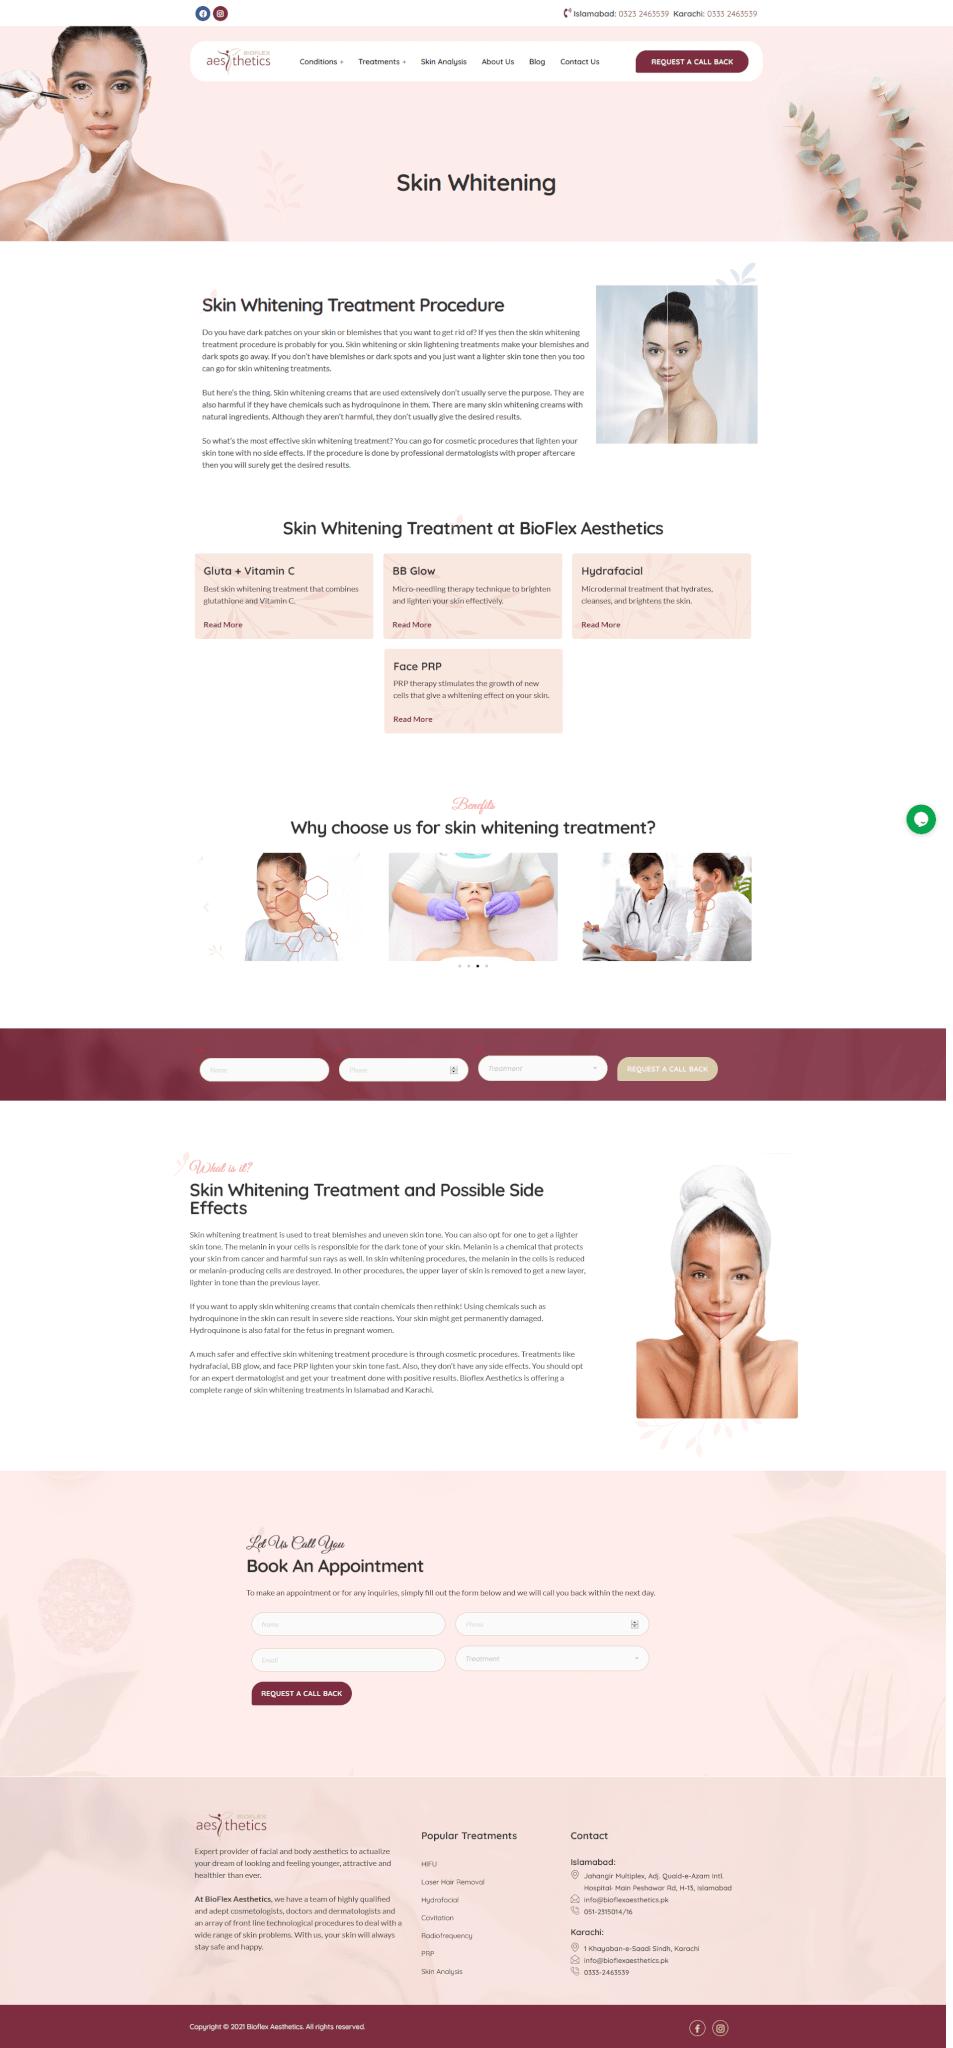 Skin-Whitening-Treatment-Procedure-BioFlex-Aesthetics